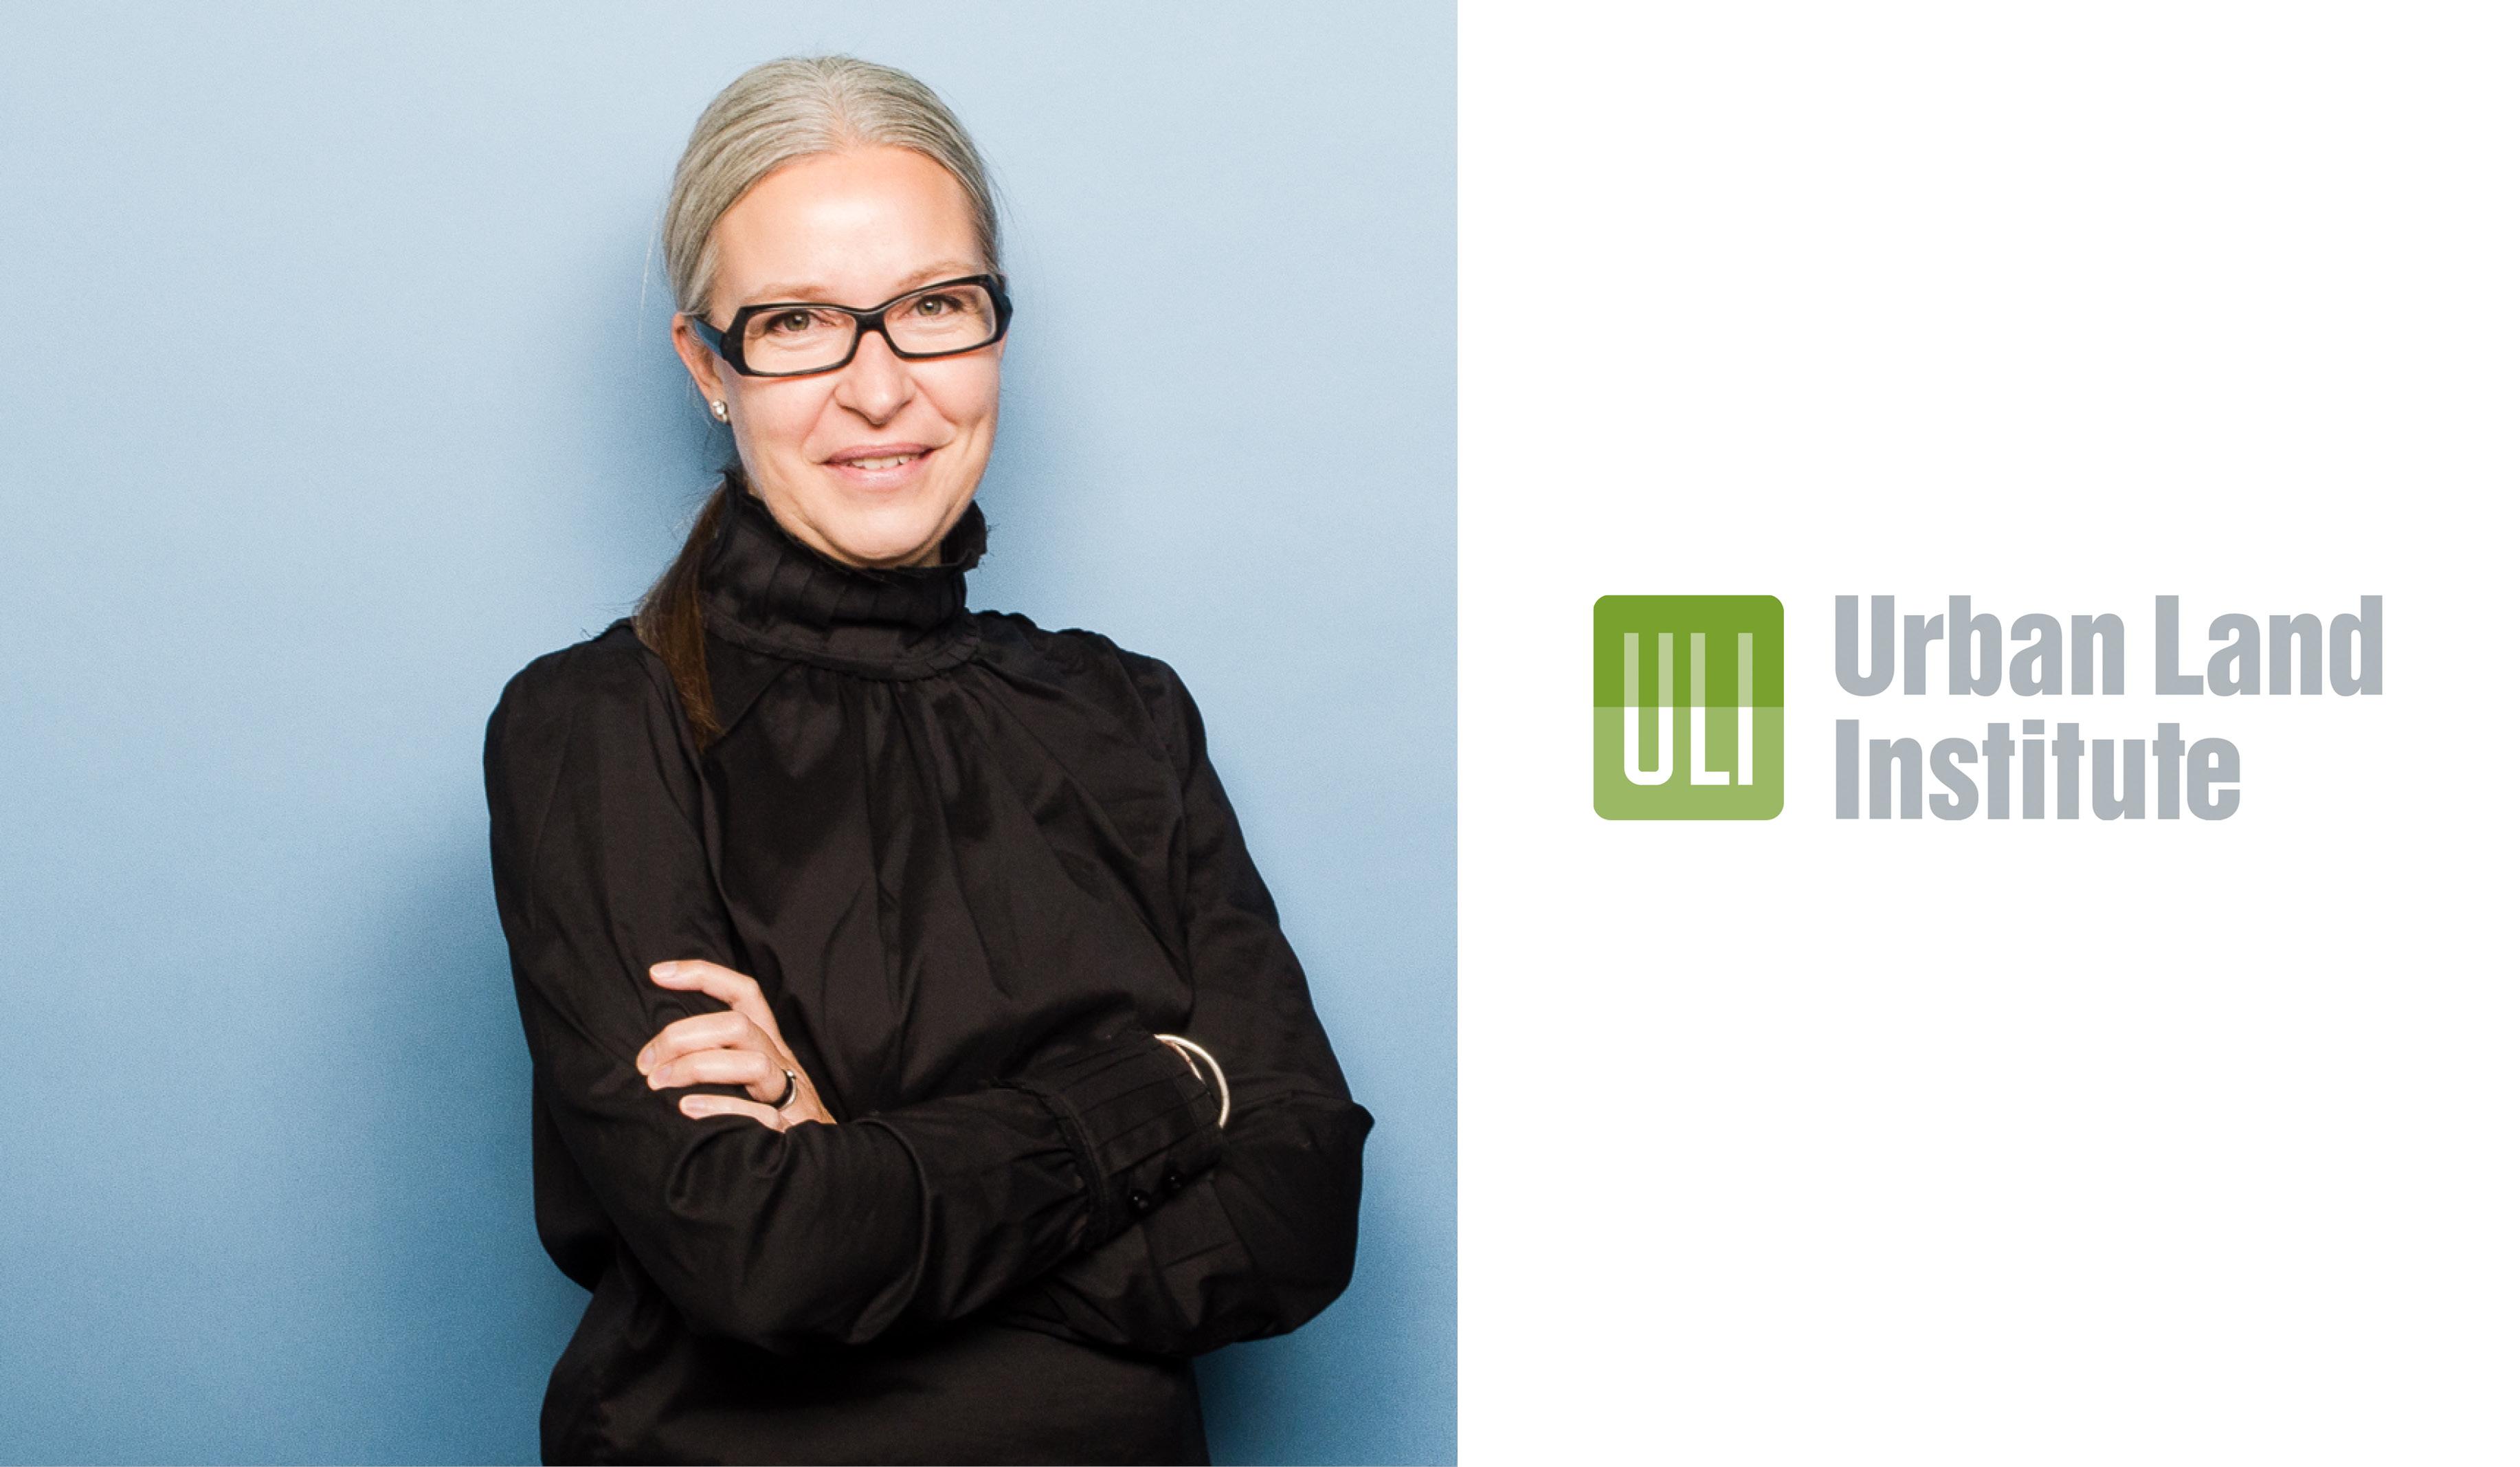 photo of Heather Rolleston beside the ULI logo